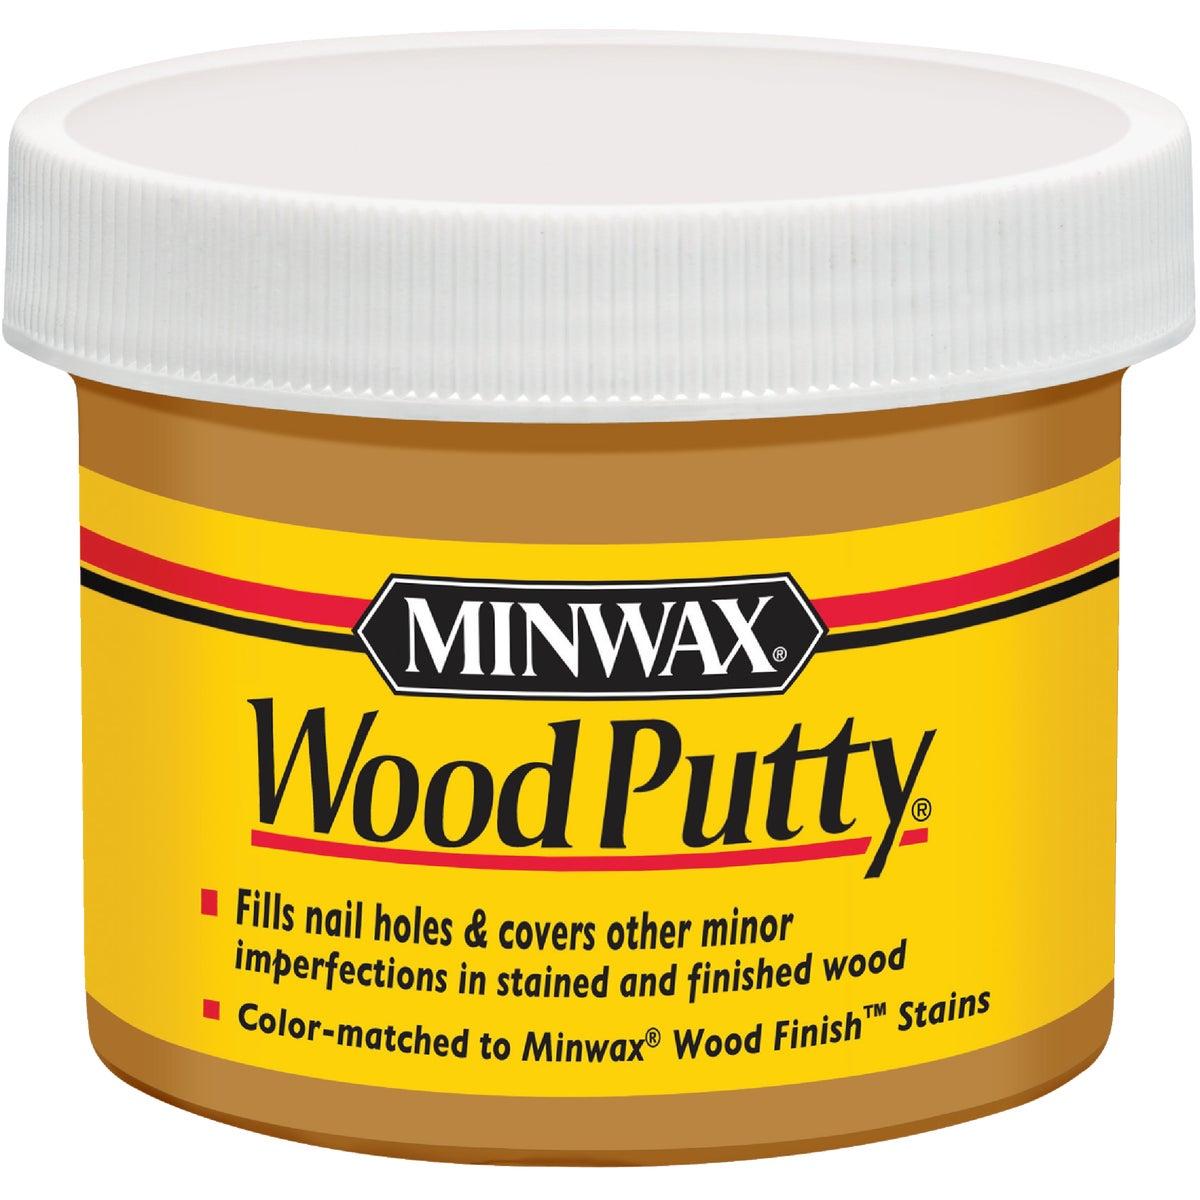 CHERRY WOOD PUTTY